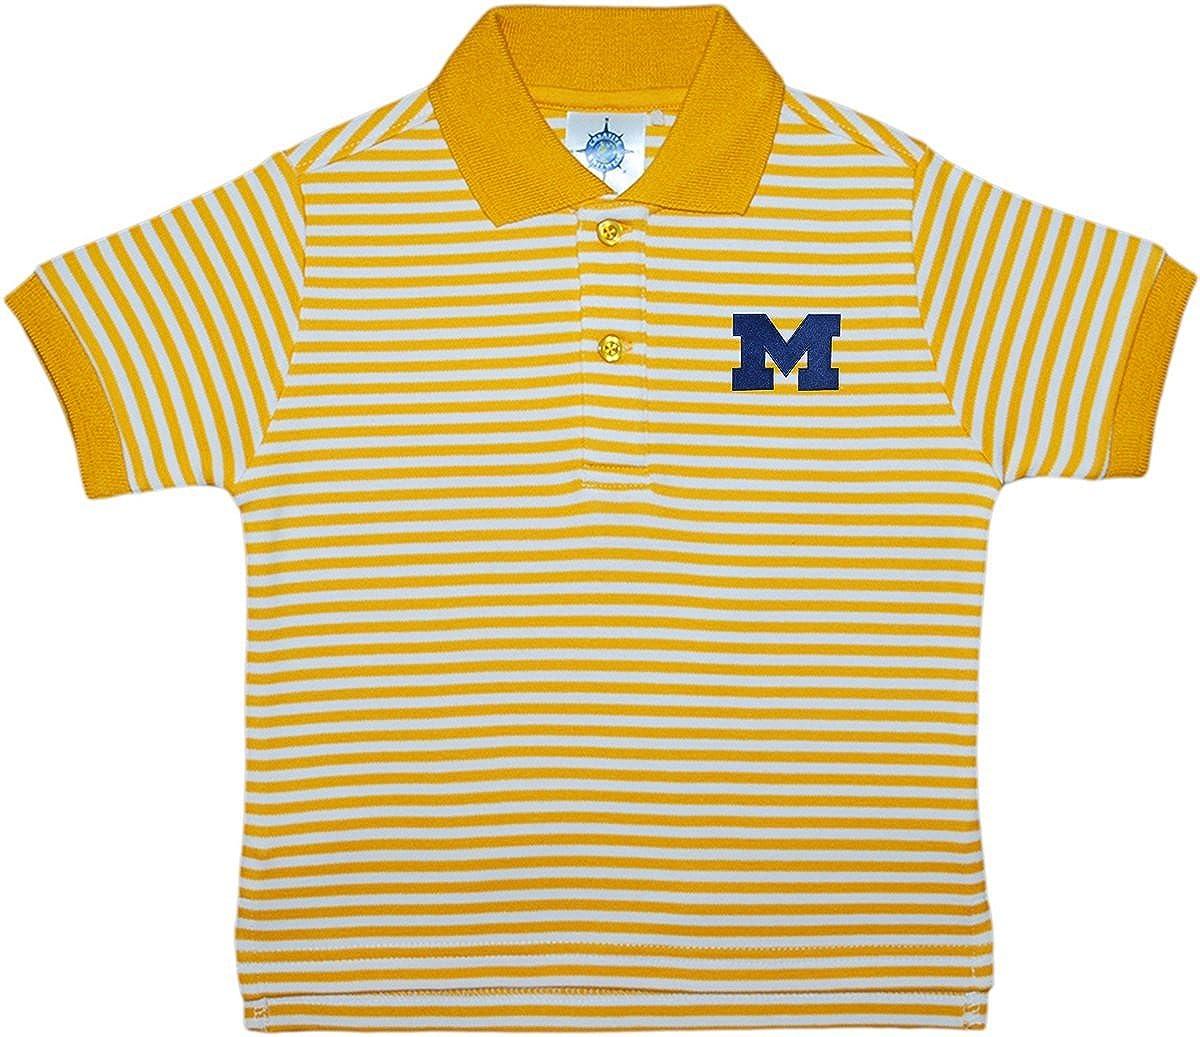 University of Michigan Wolverines Striped Polo Shirt